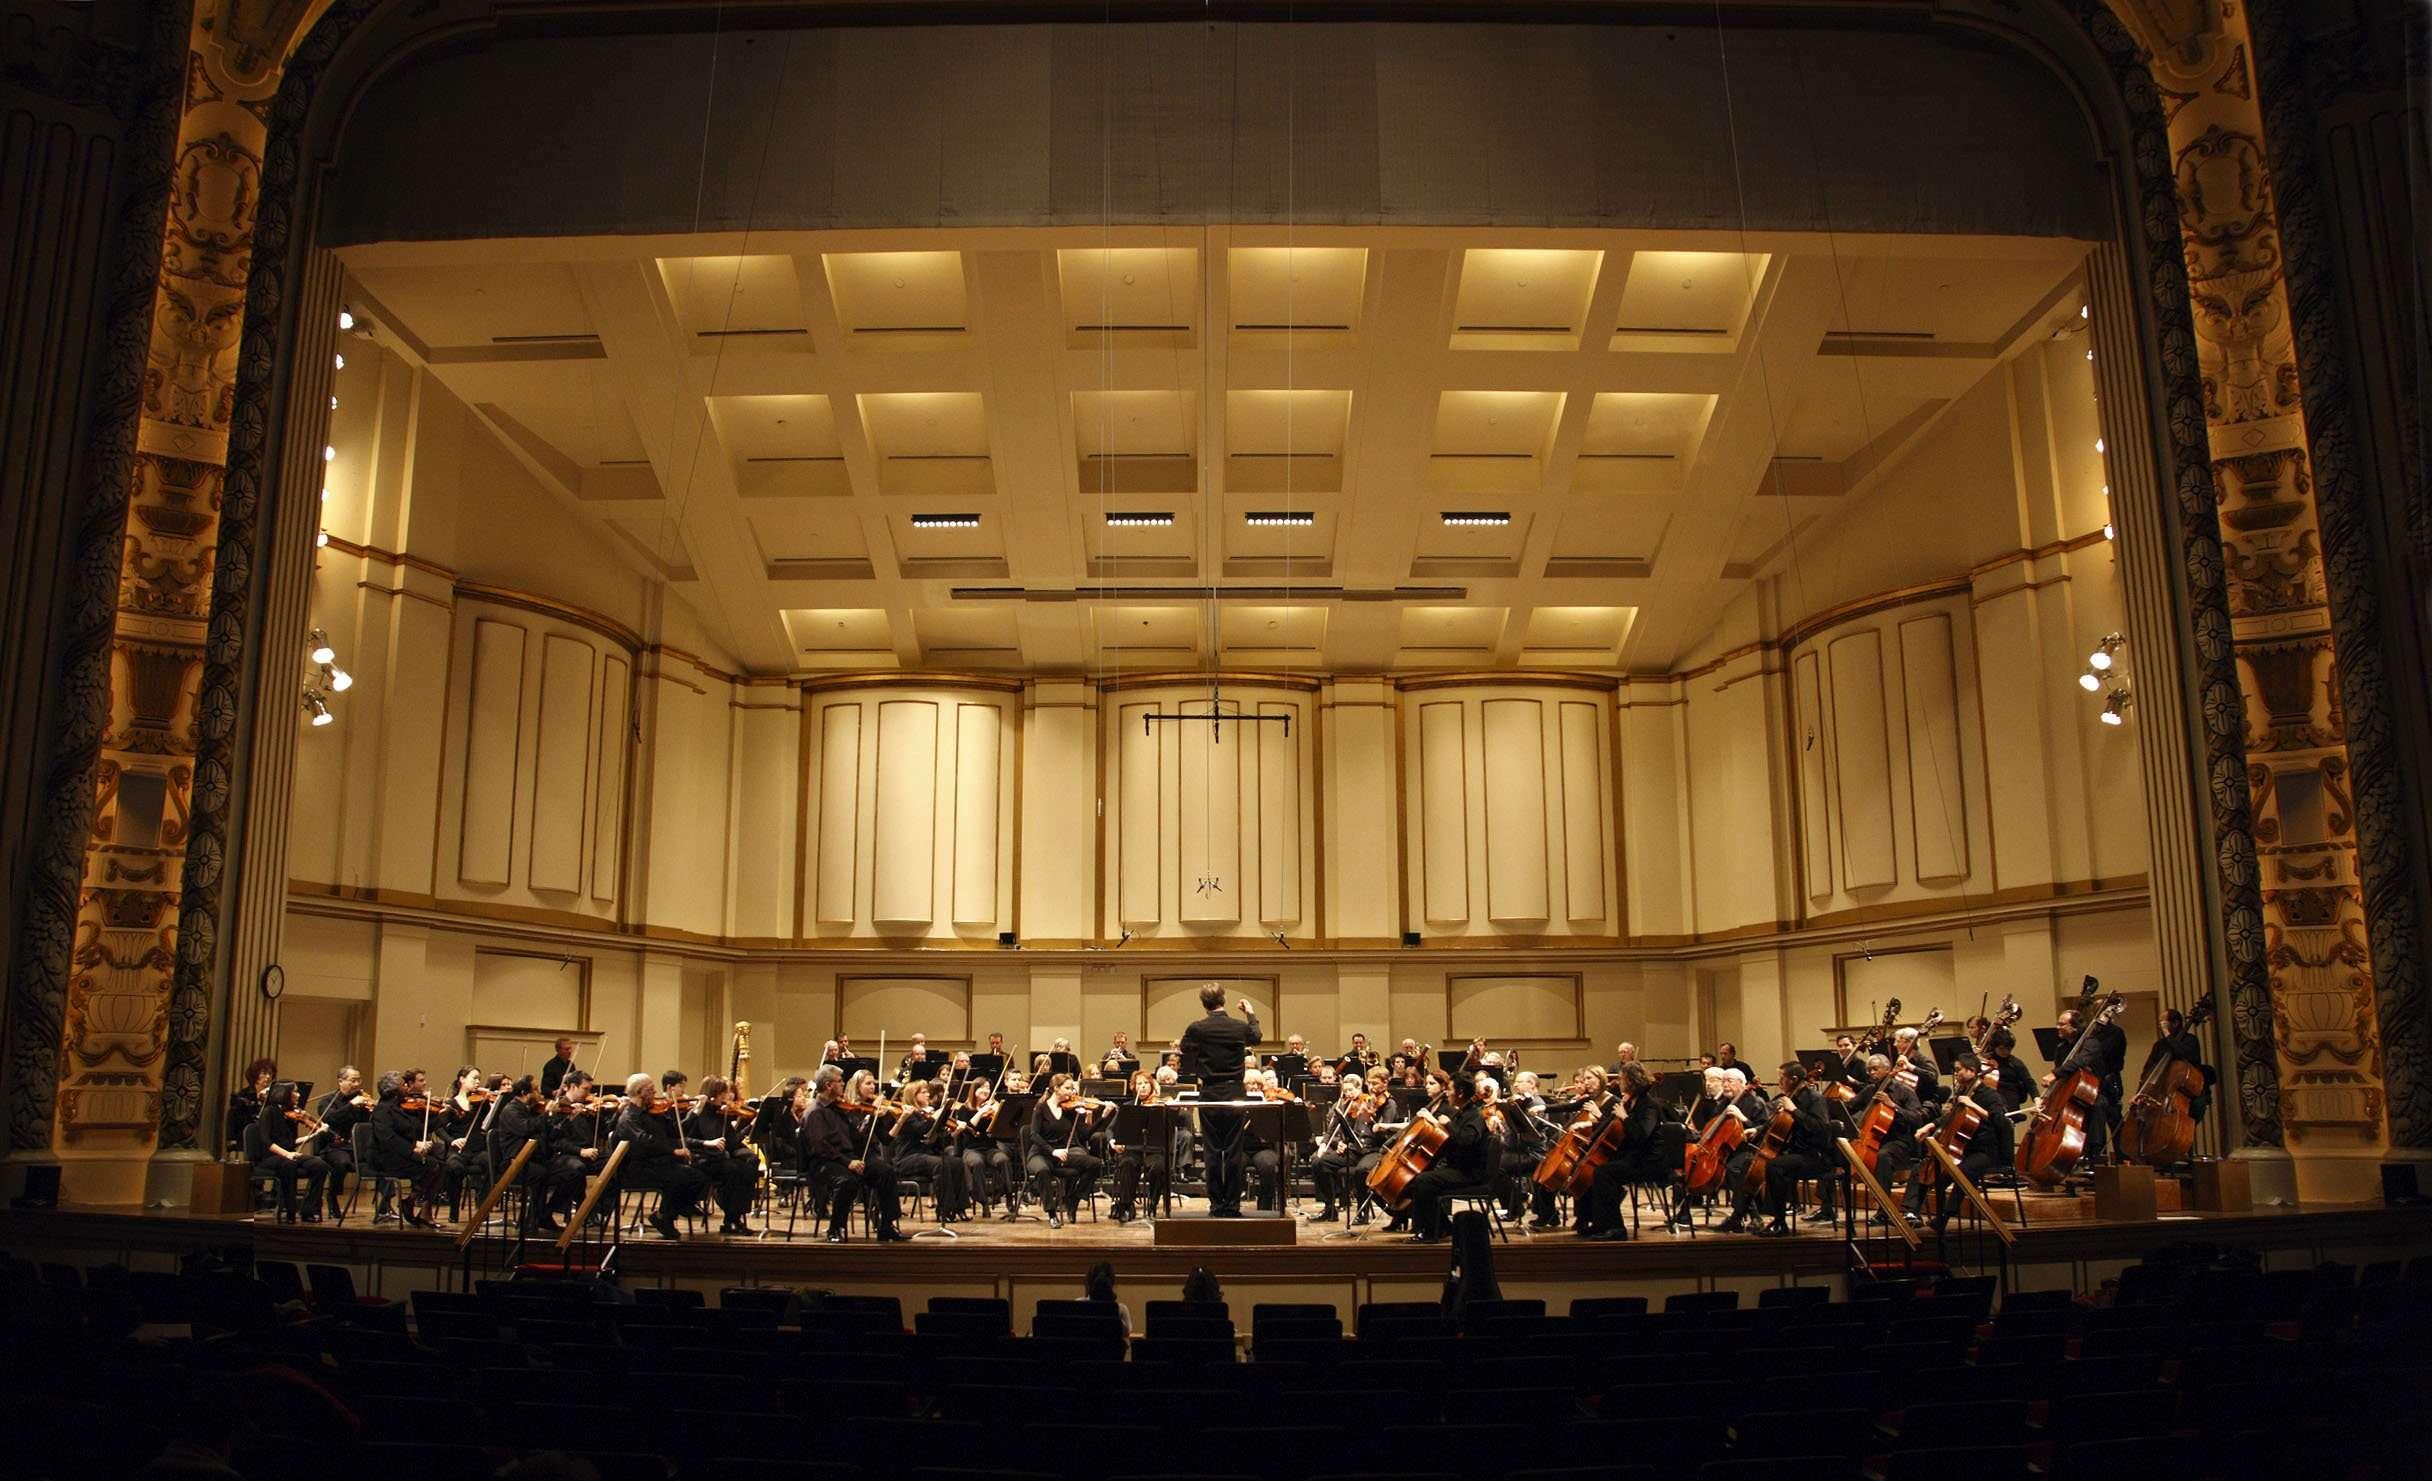 St. Louis Symphony Orchestra. Photo Credit: Scott Ferguson